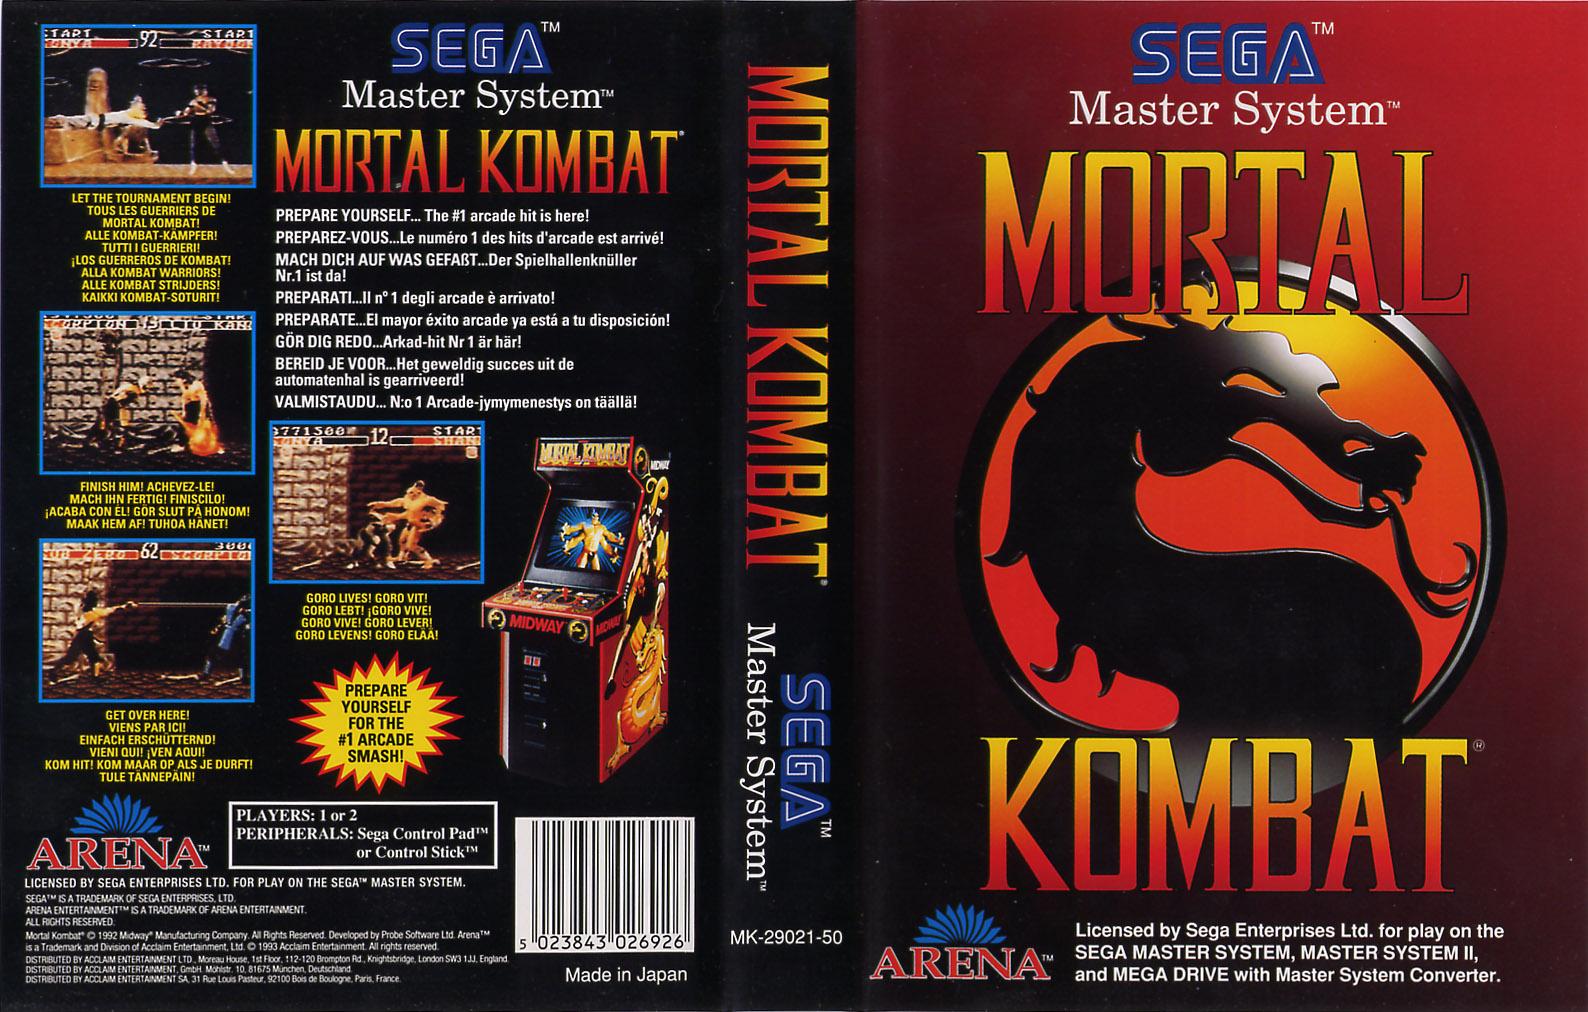 http://www.smspower.org/uploads/Scans/MortalKombat-SMS-EU.jpg